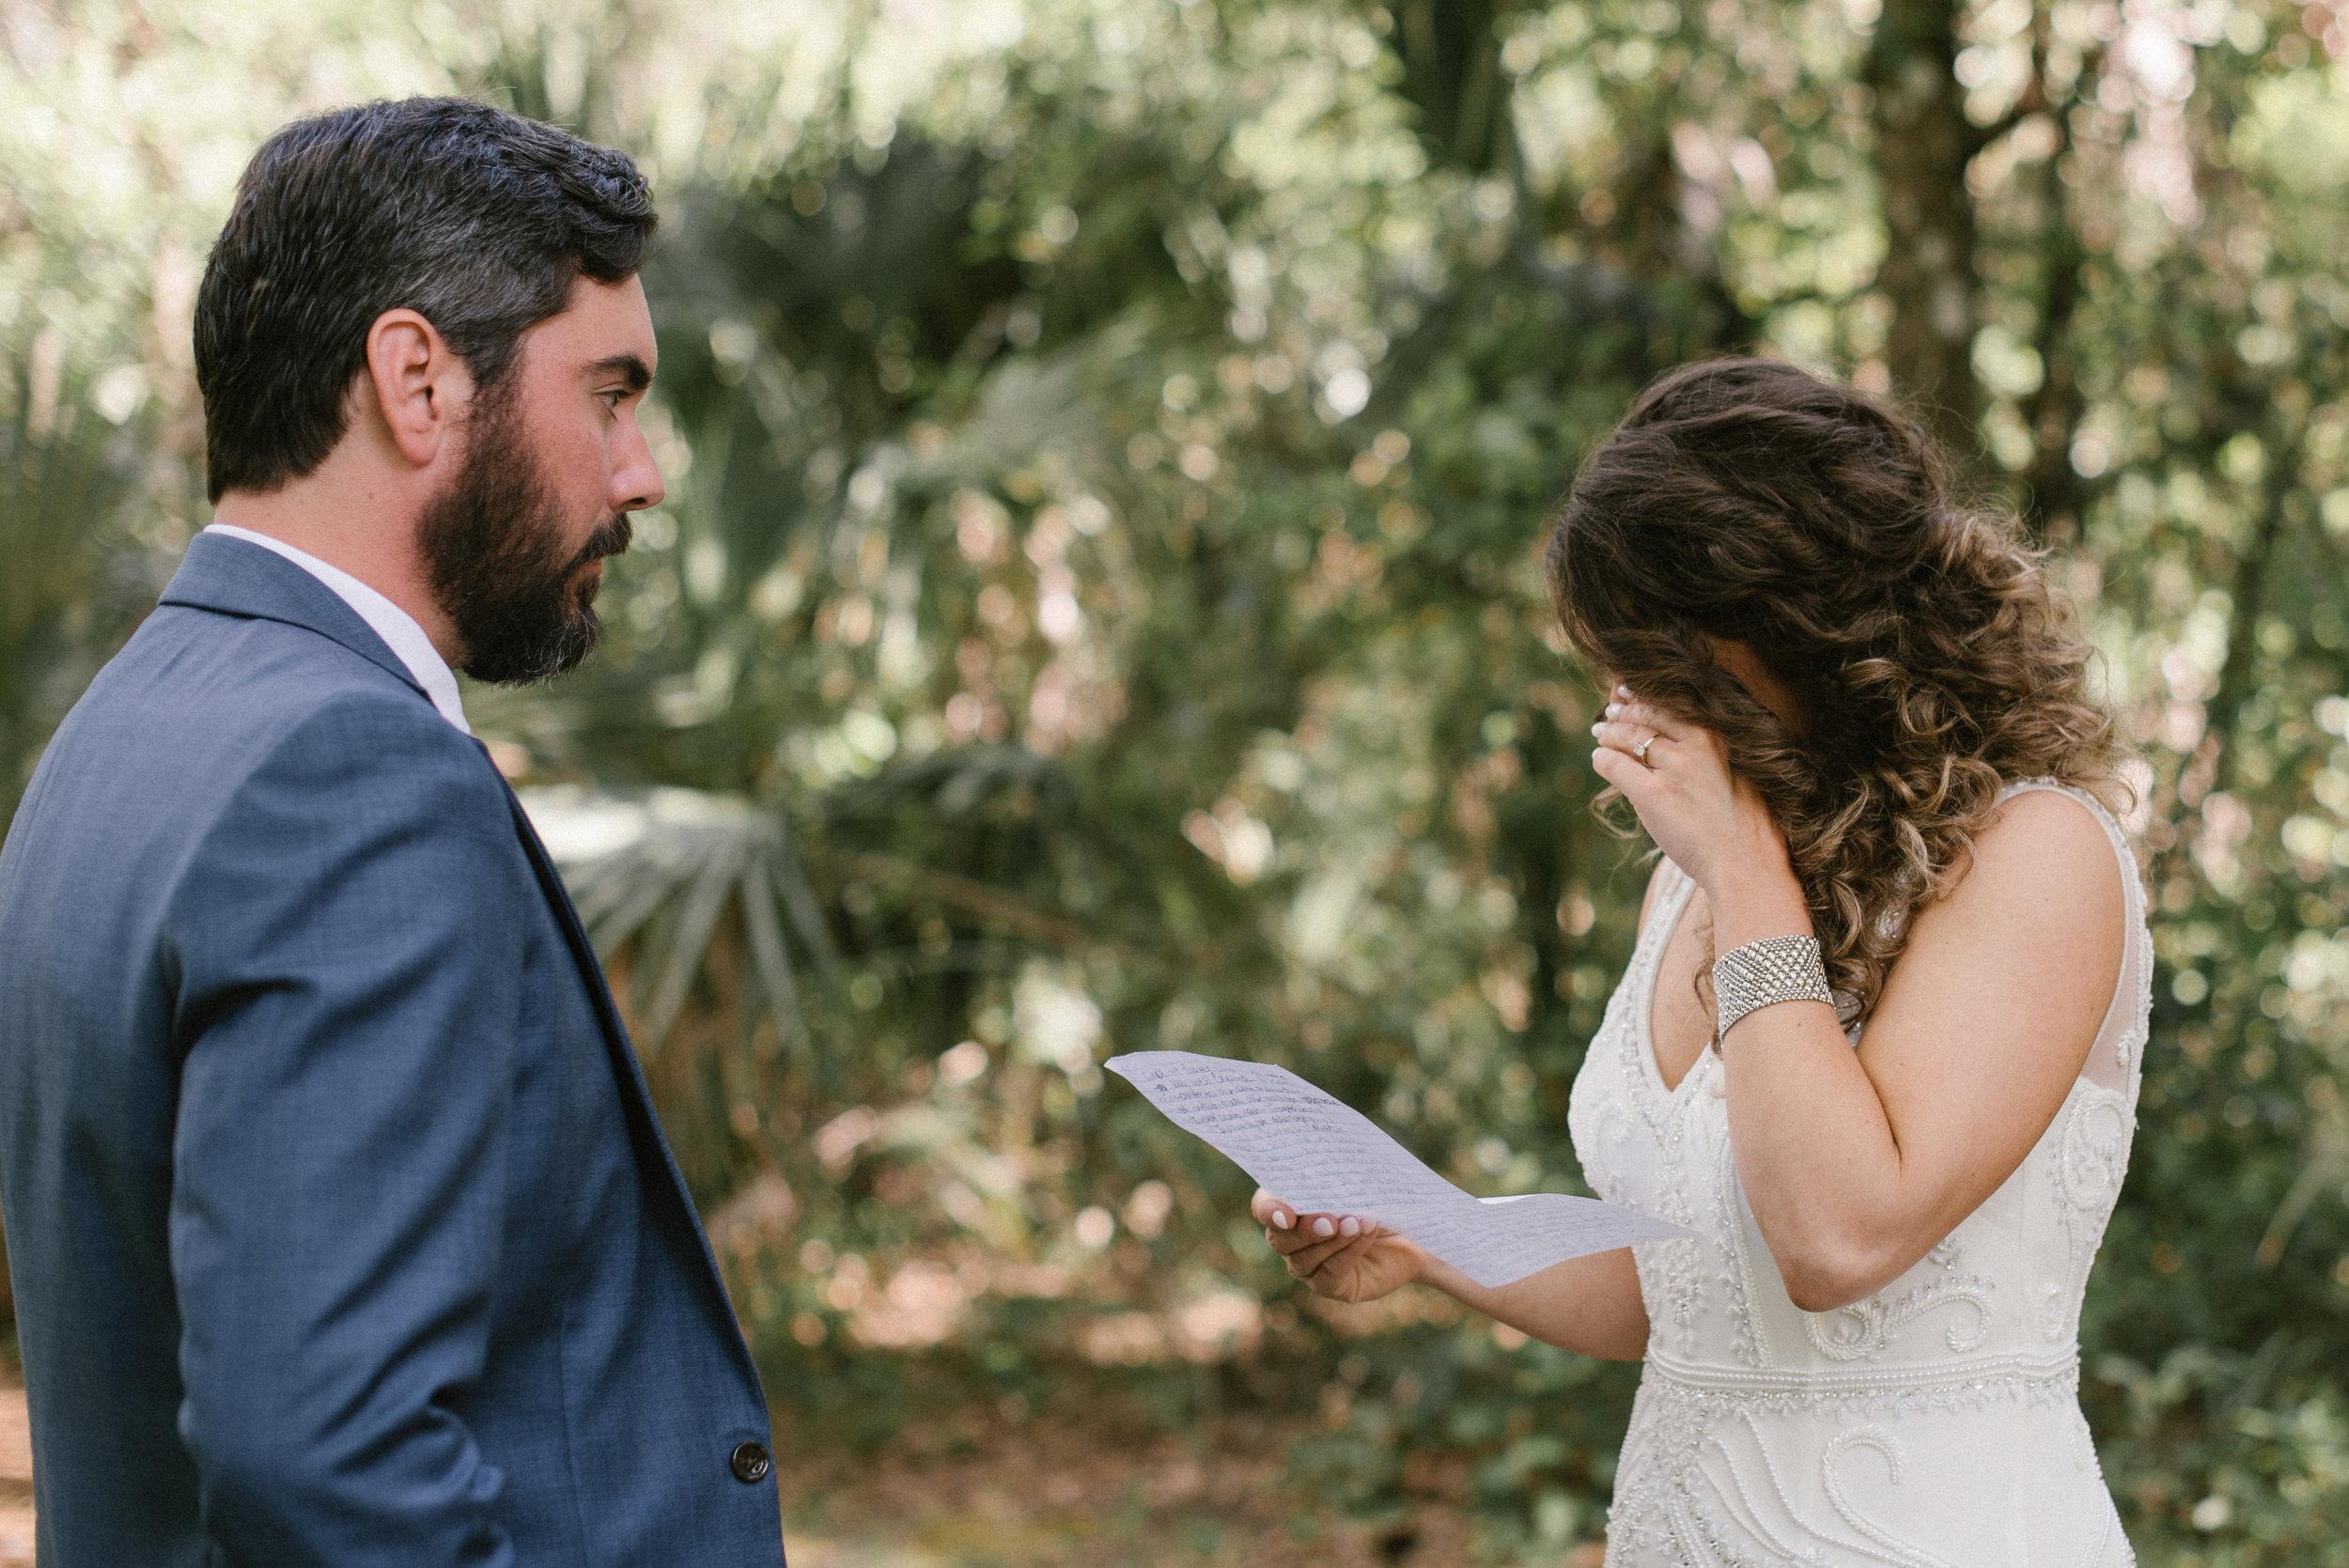 mclaughlin-wedding-291.jpg